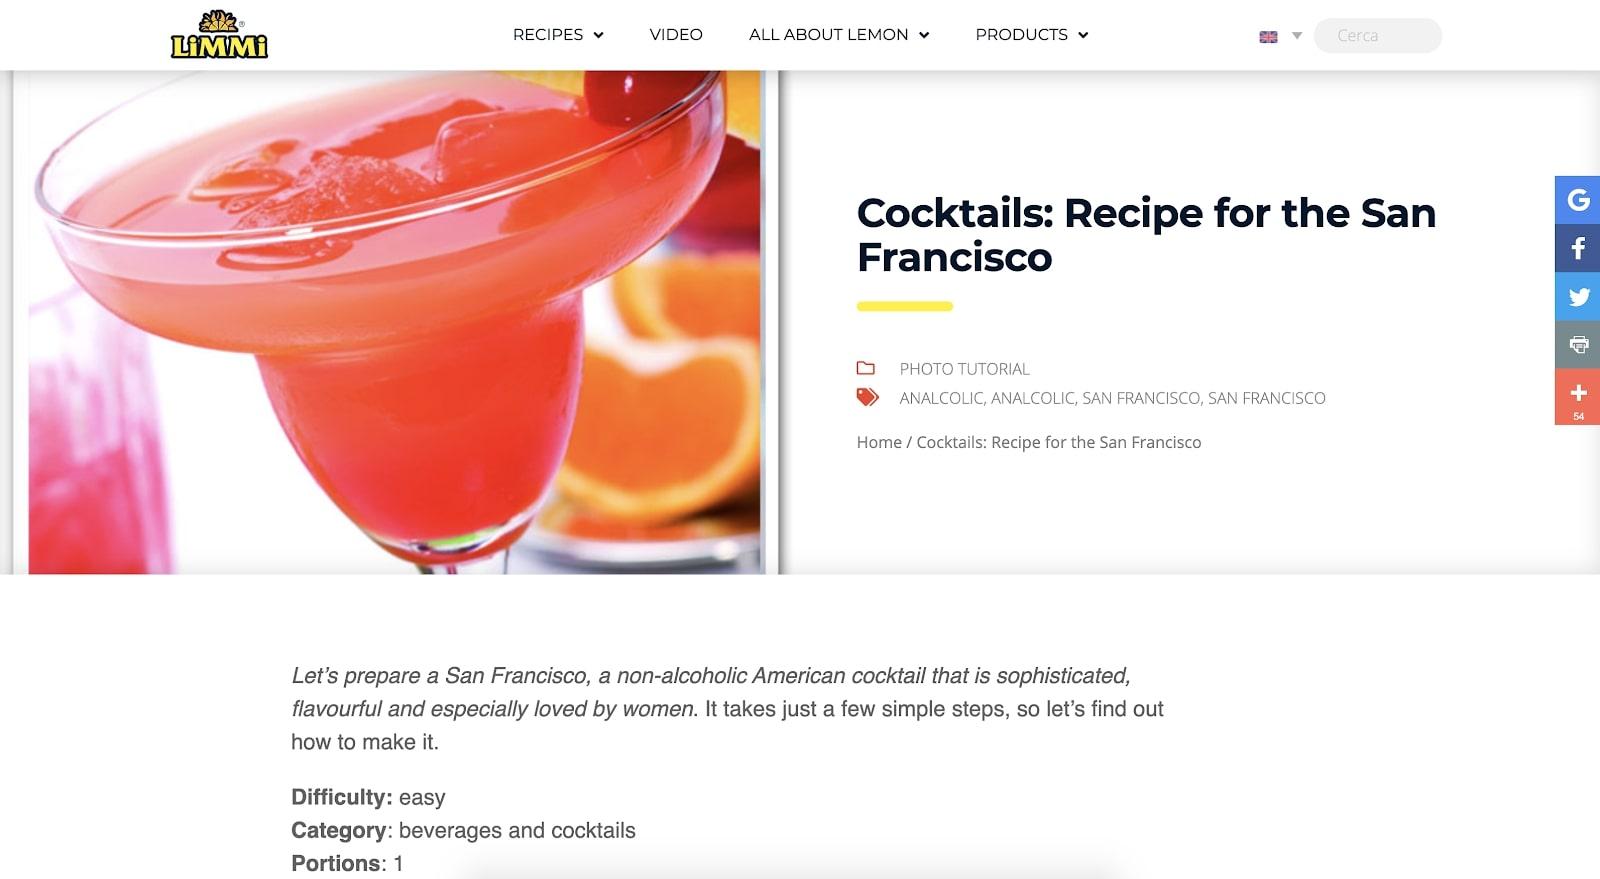 limmi lemon blog recipe